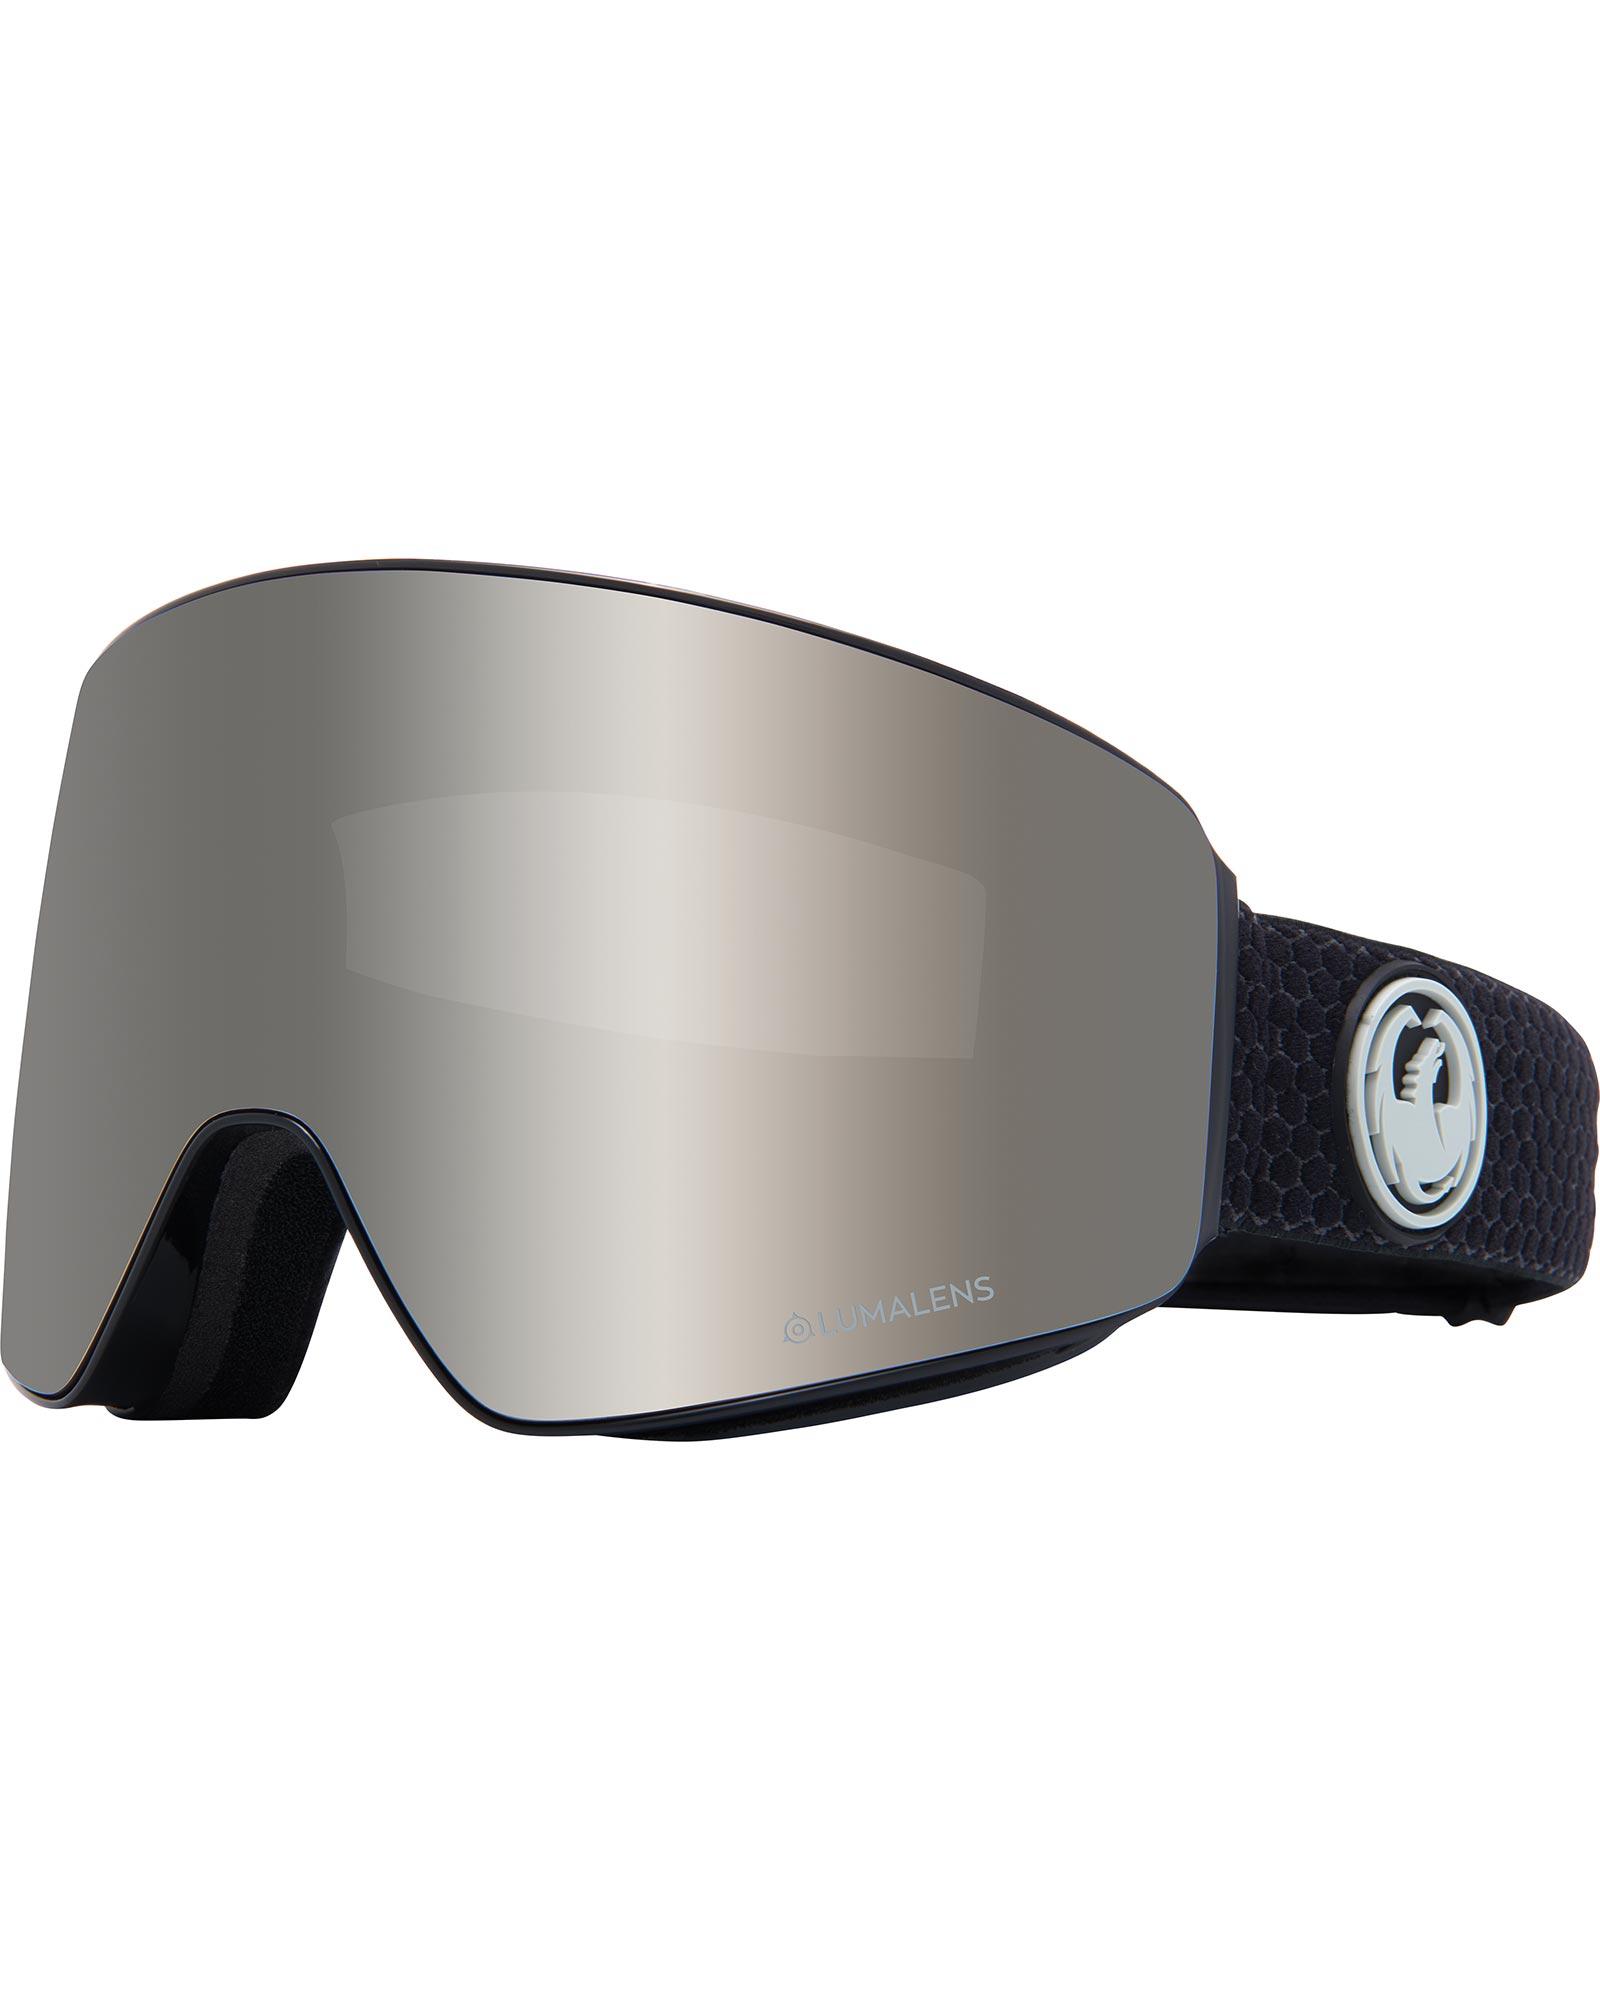 Dragon PXV Split / Lumalens Silver Ionized + Lumalens Flash Blue Goggles 0